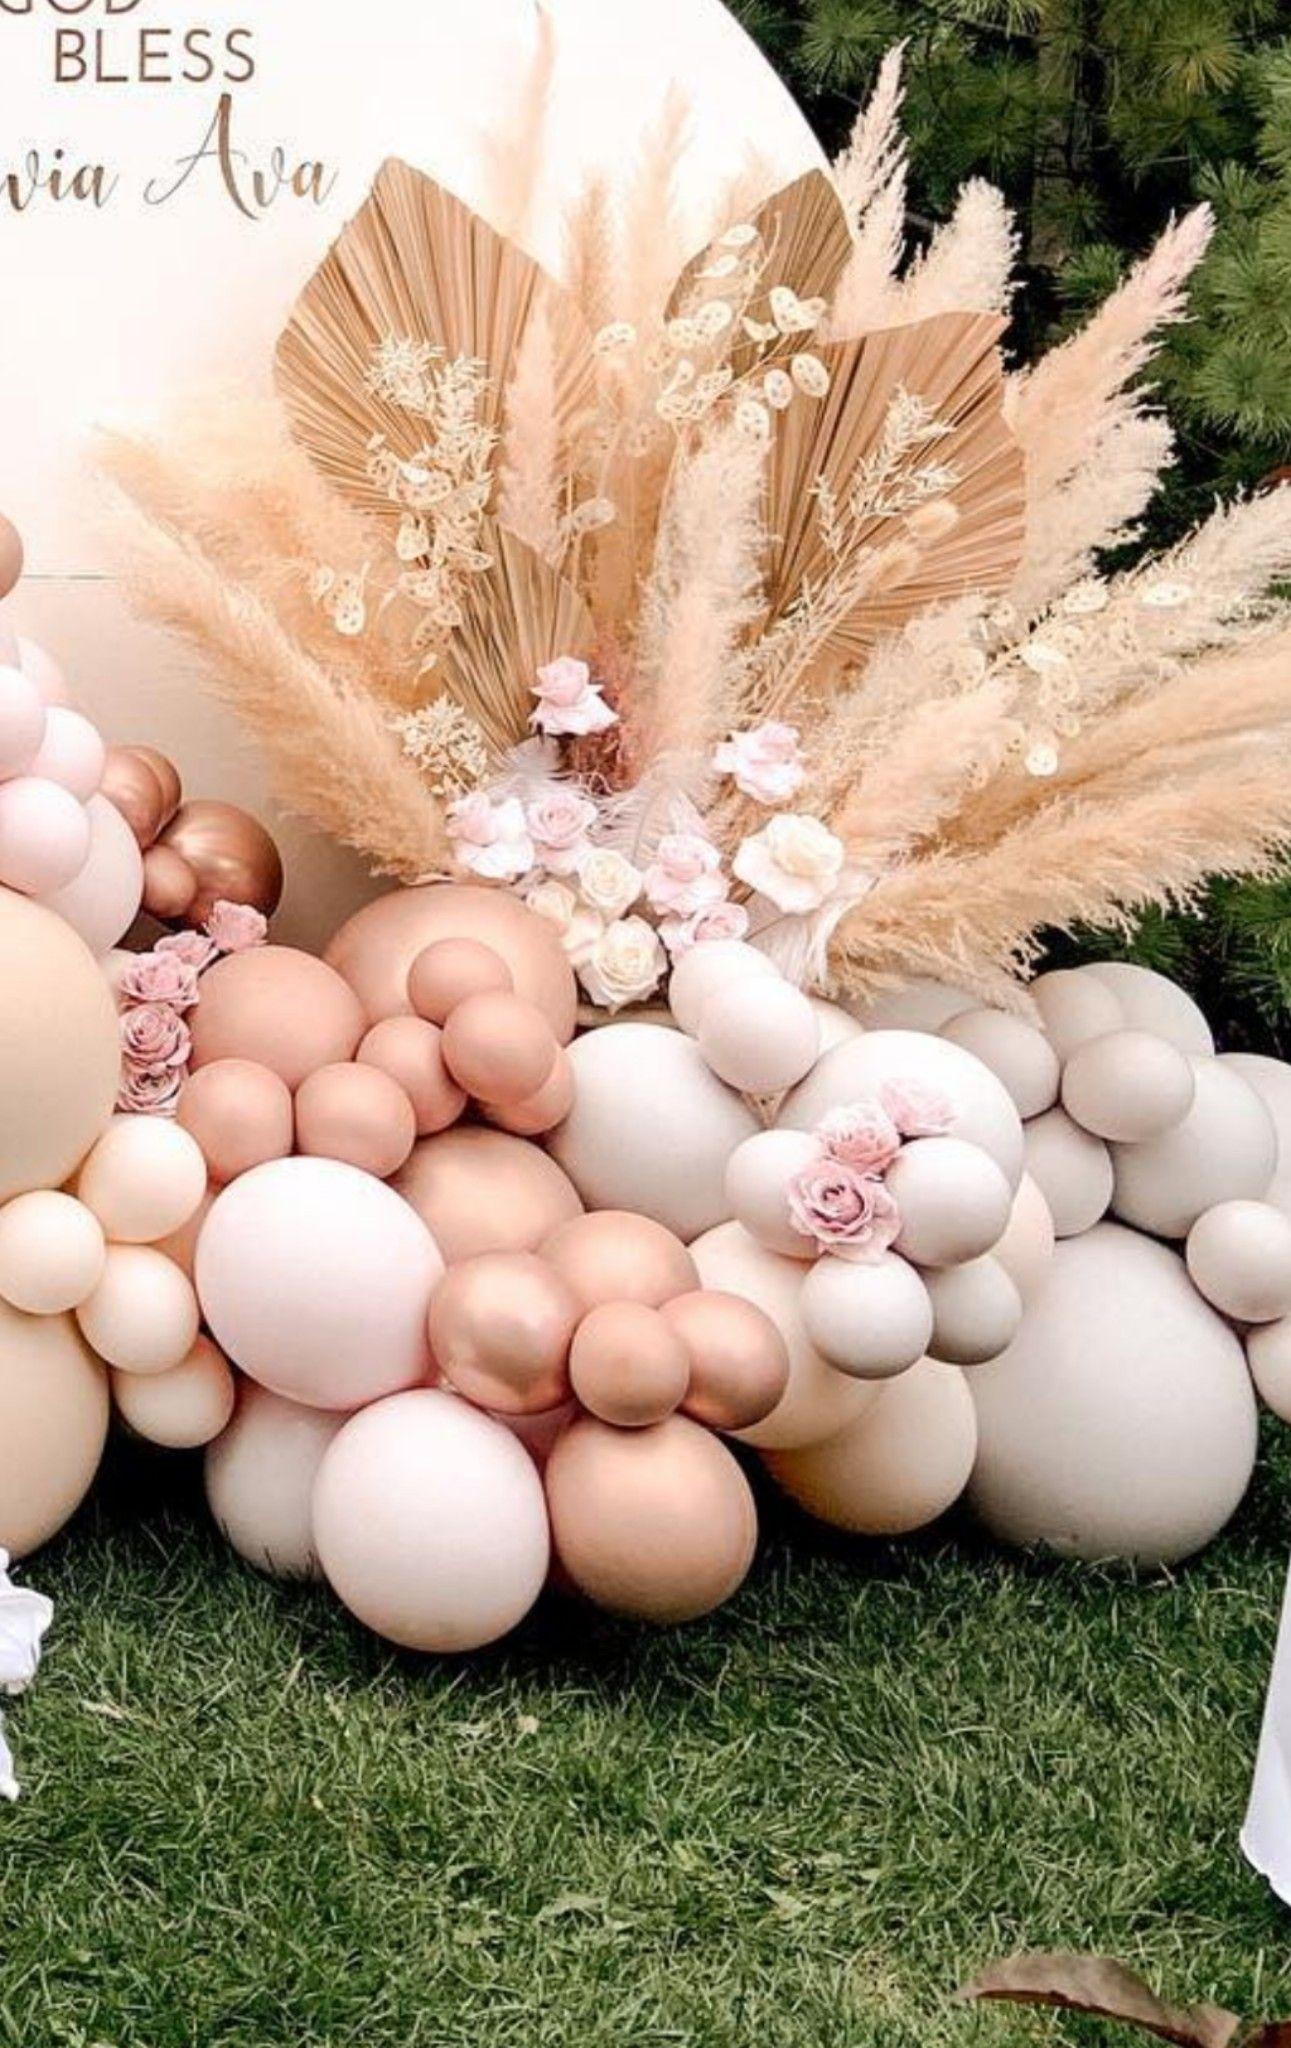 White Pampas Grass 🔸 Beige Pampas Grass in 2021 | Baby shower decorations,  Baby shower inspiration, Birthday balloon decorations